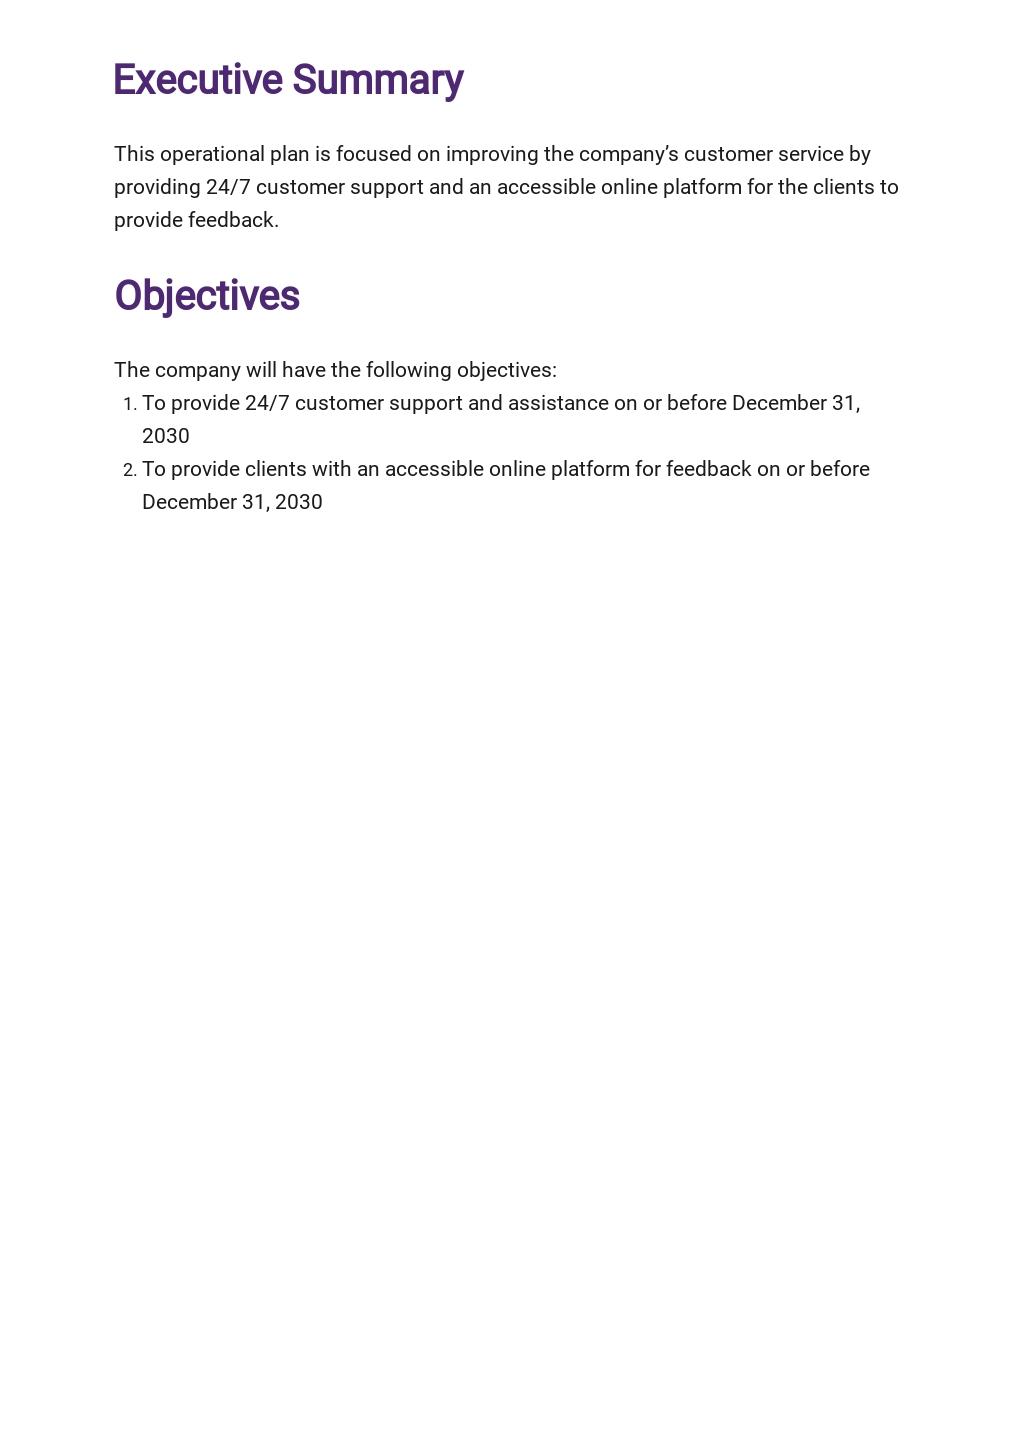 Customer Service Operational Plan Template 1.jpe